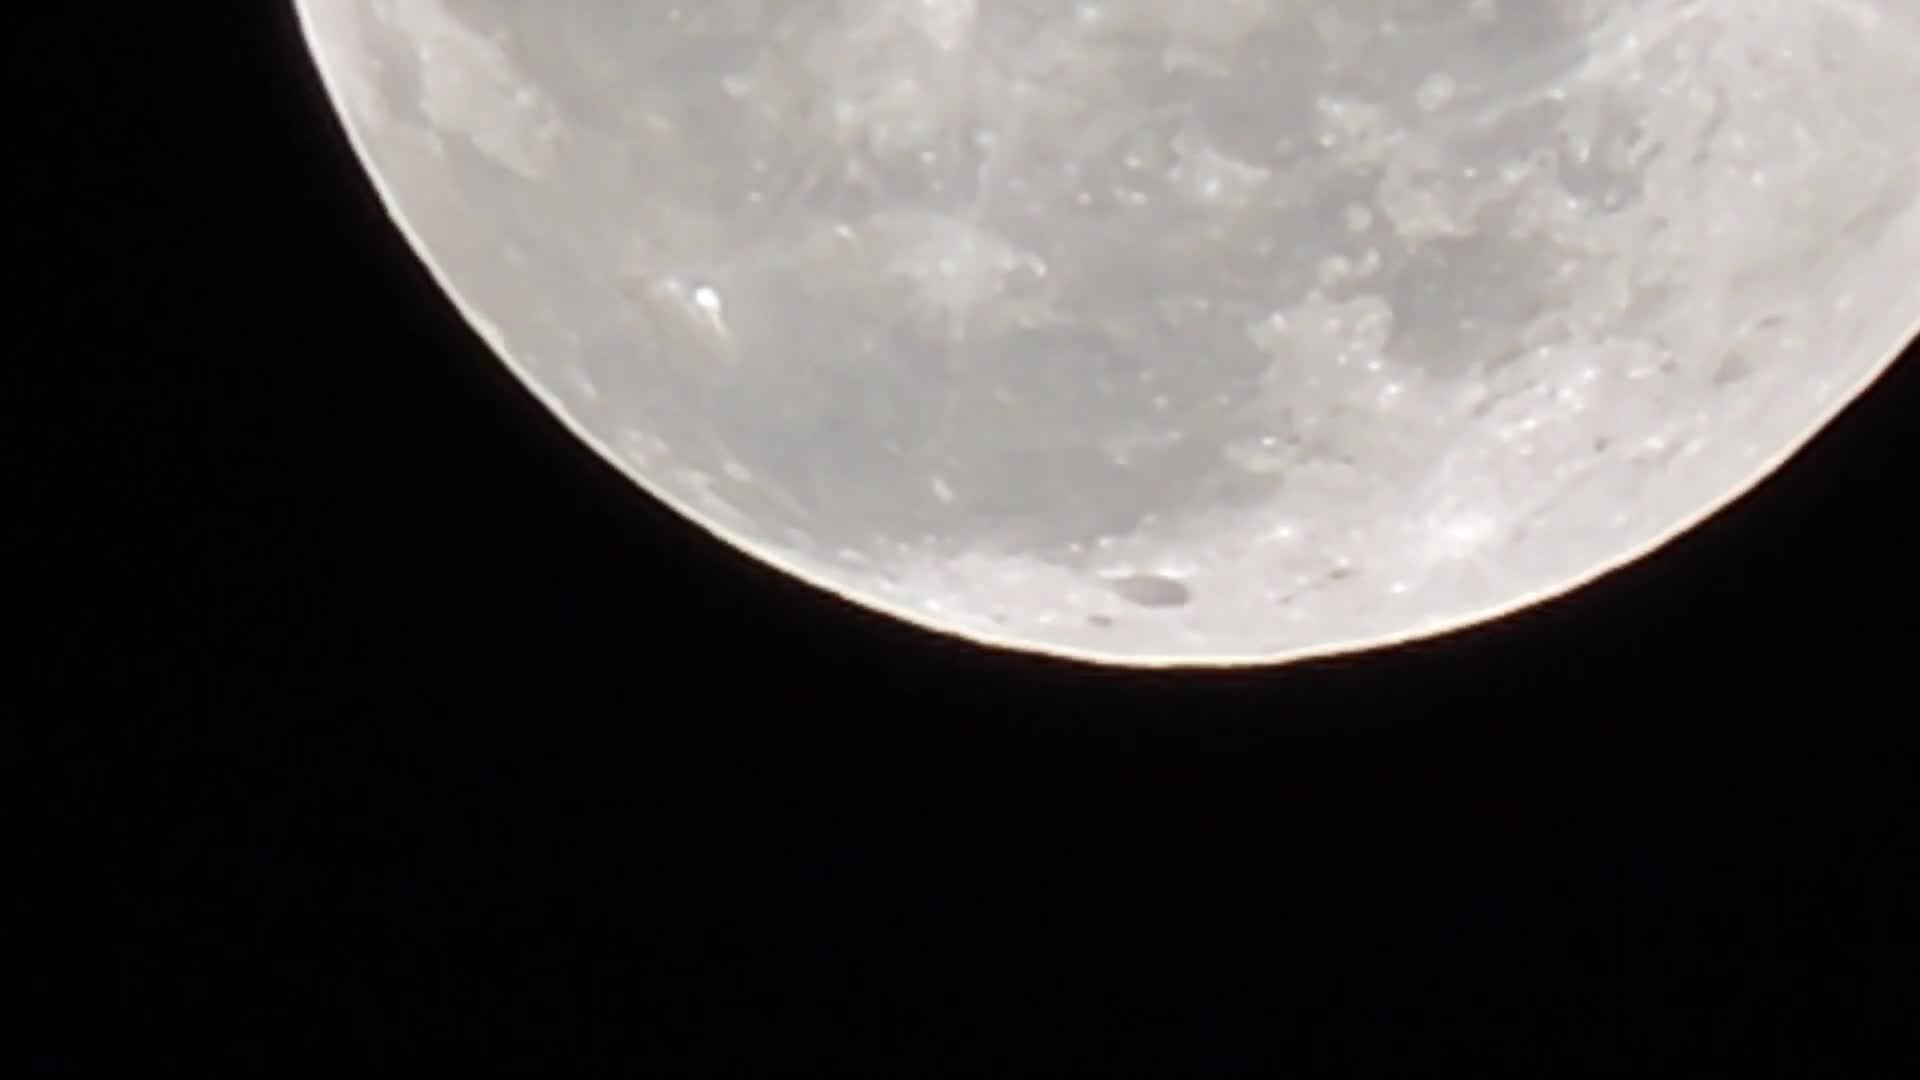 lunar, moon, السماء, القمر, سرعة القمر, صالح العنزي, moon , lunar GIFs